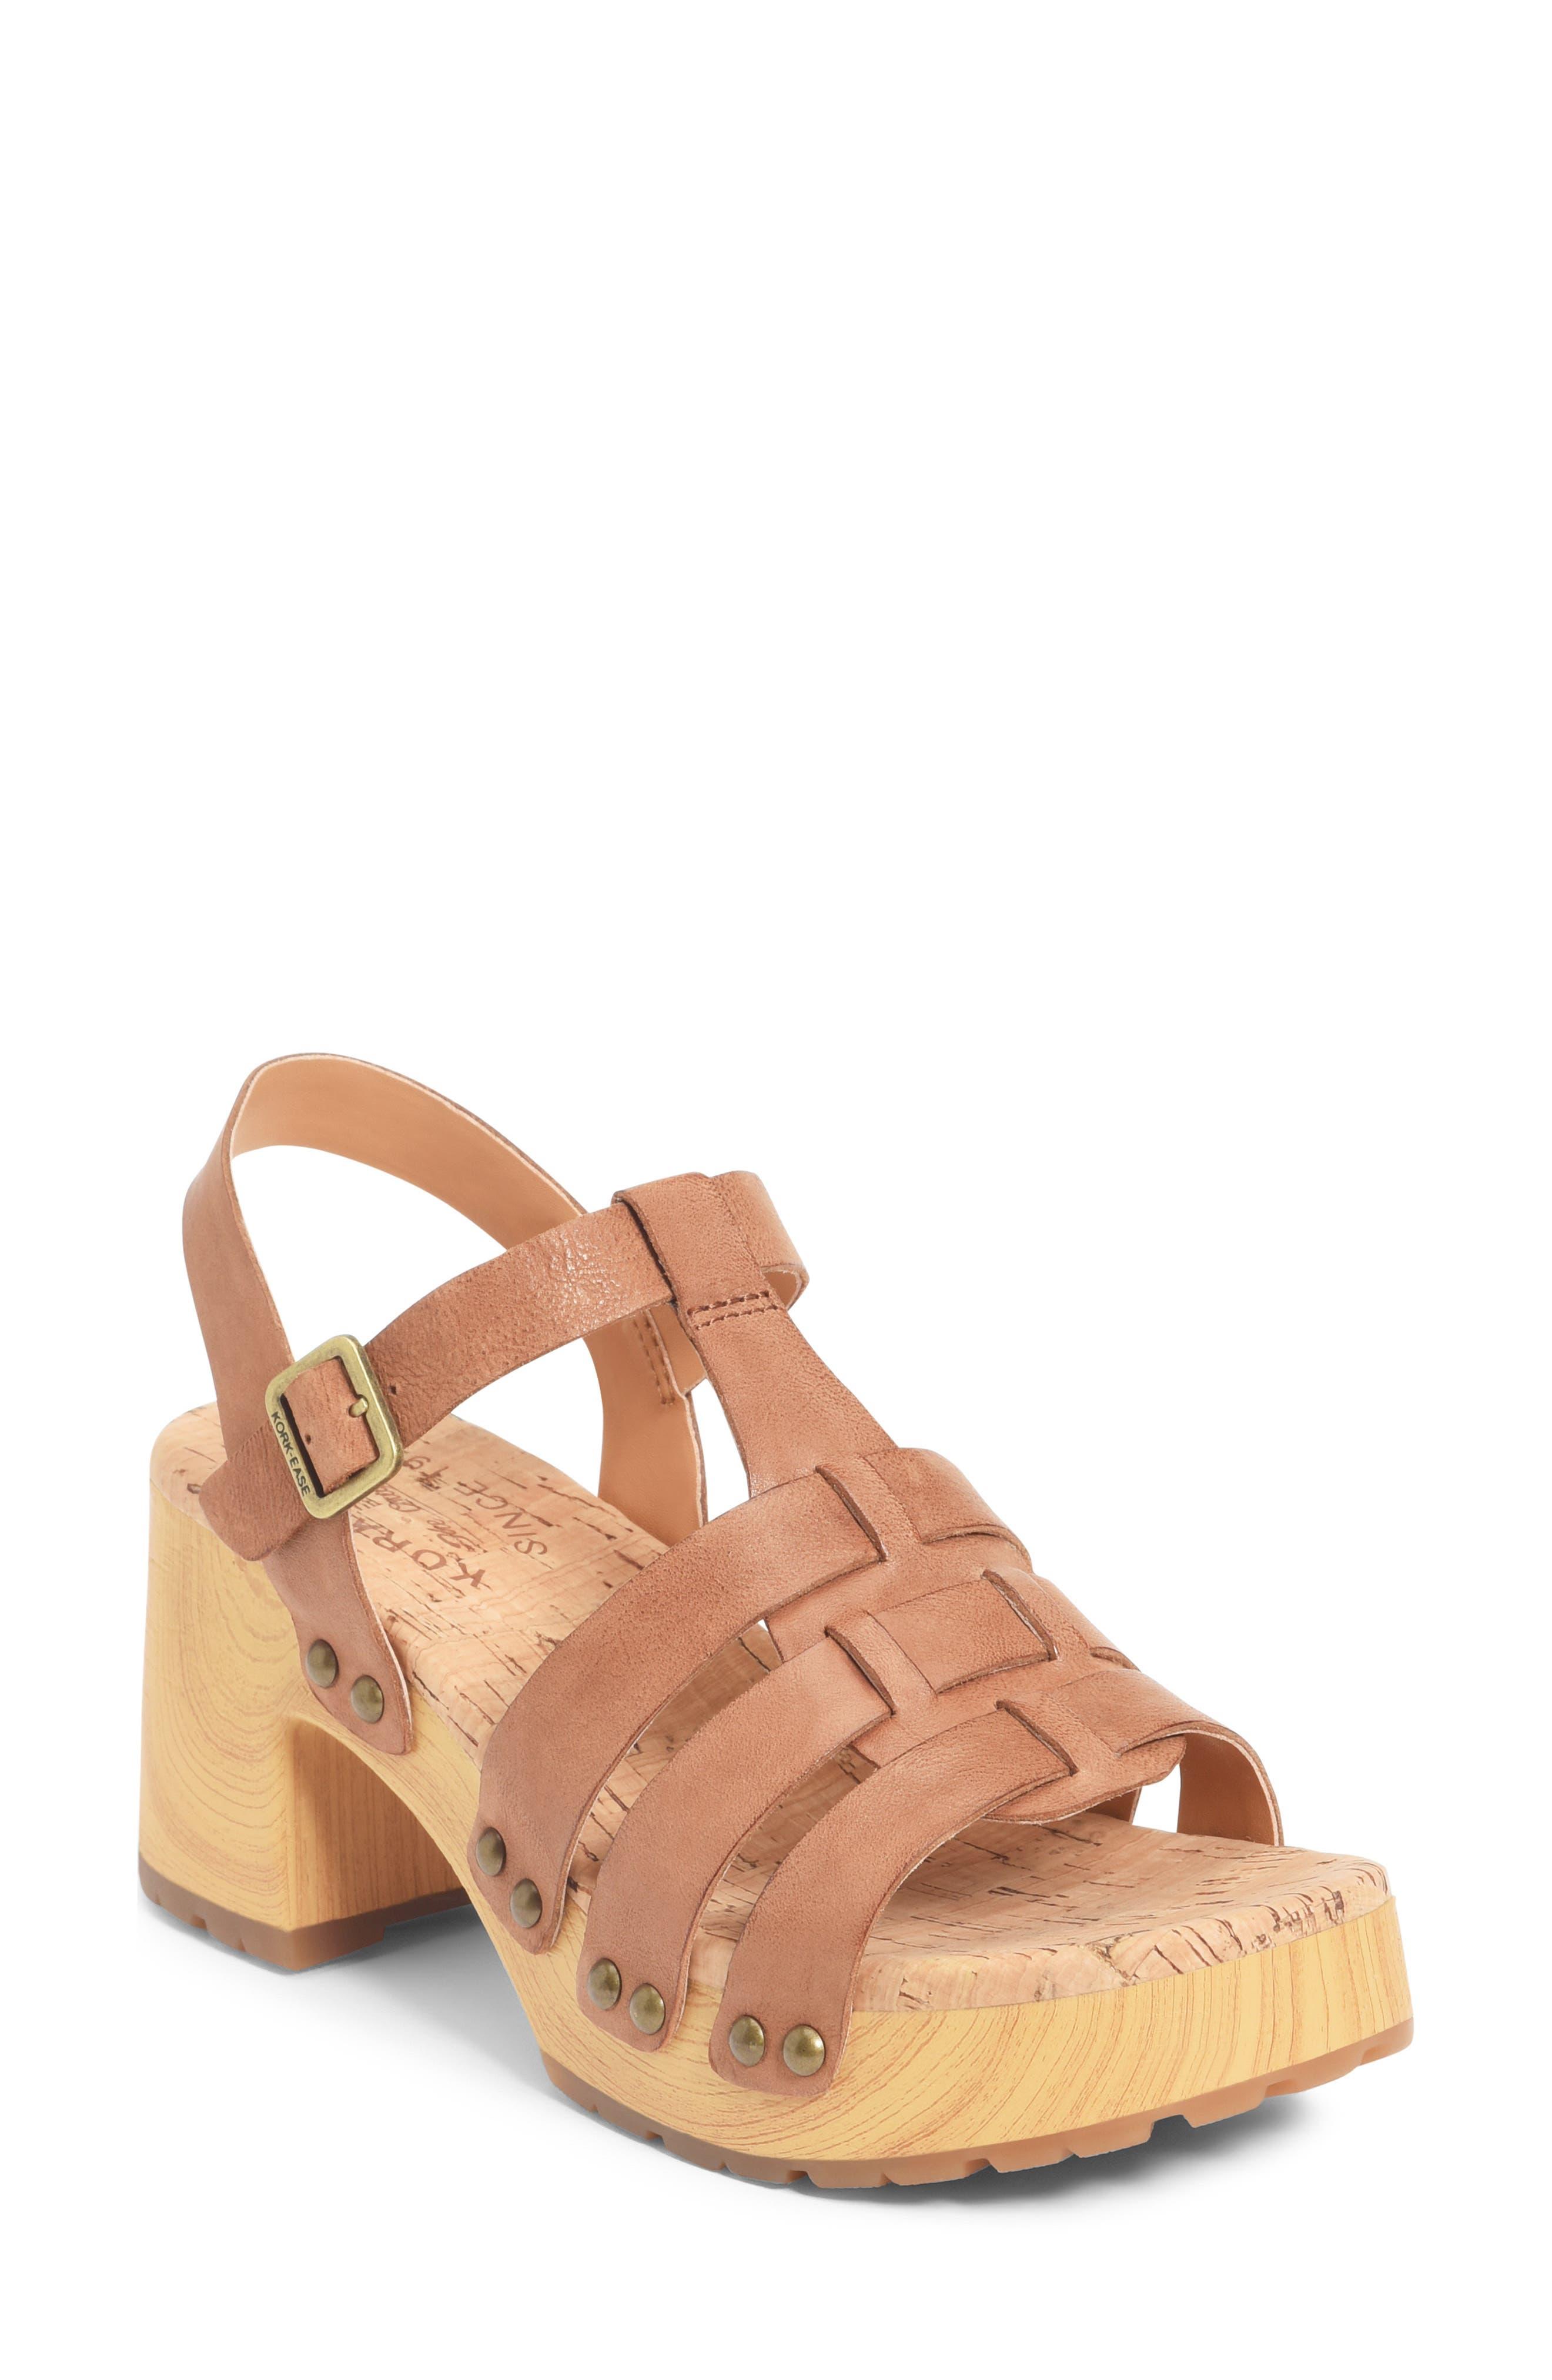 Women's Kork-Ease Talia Strappy Sandal